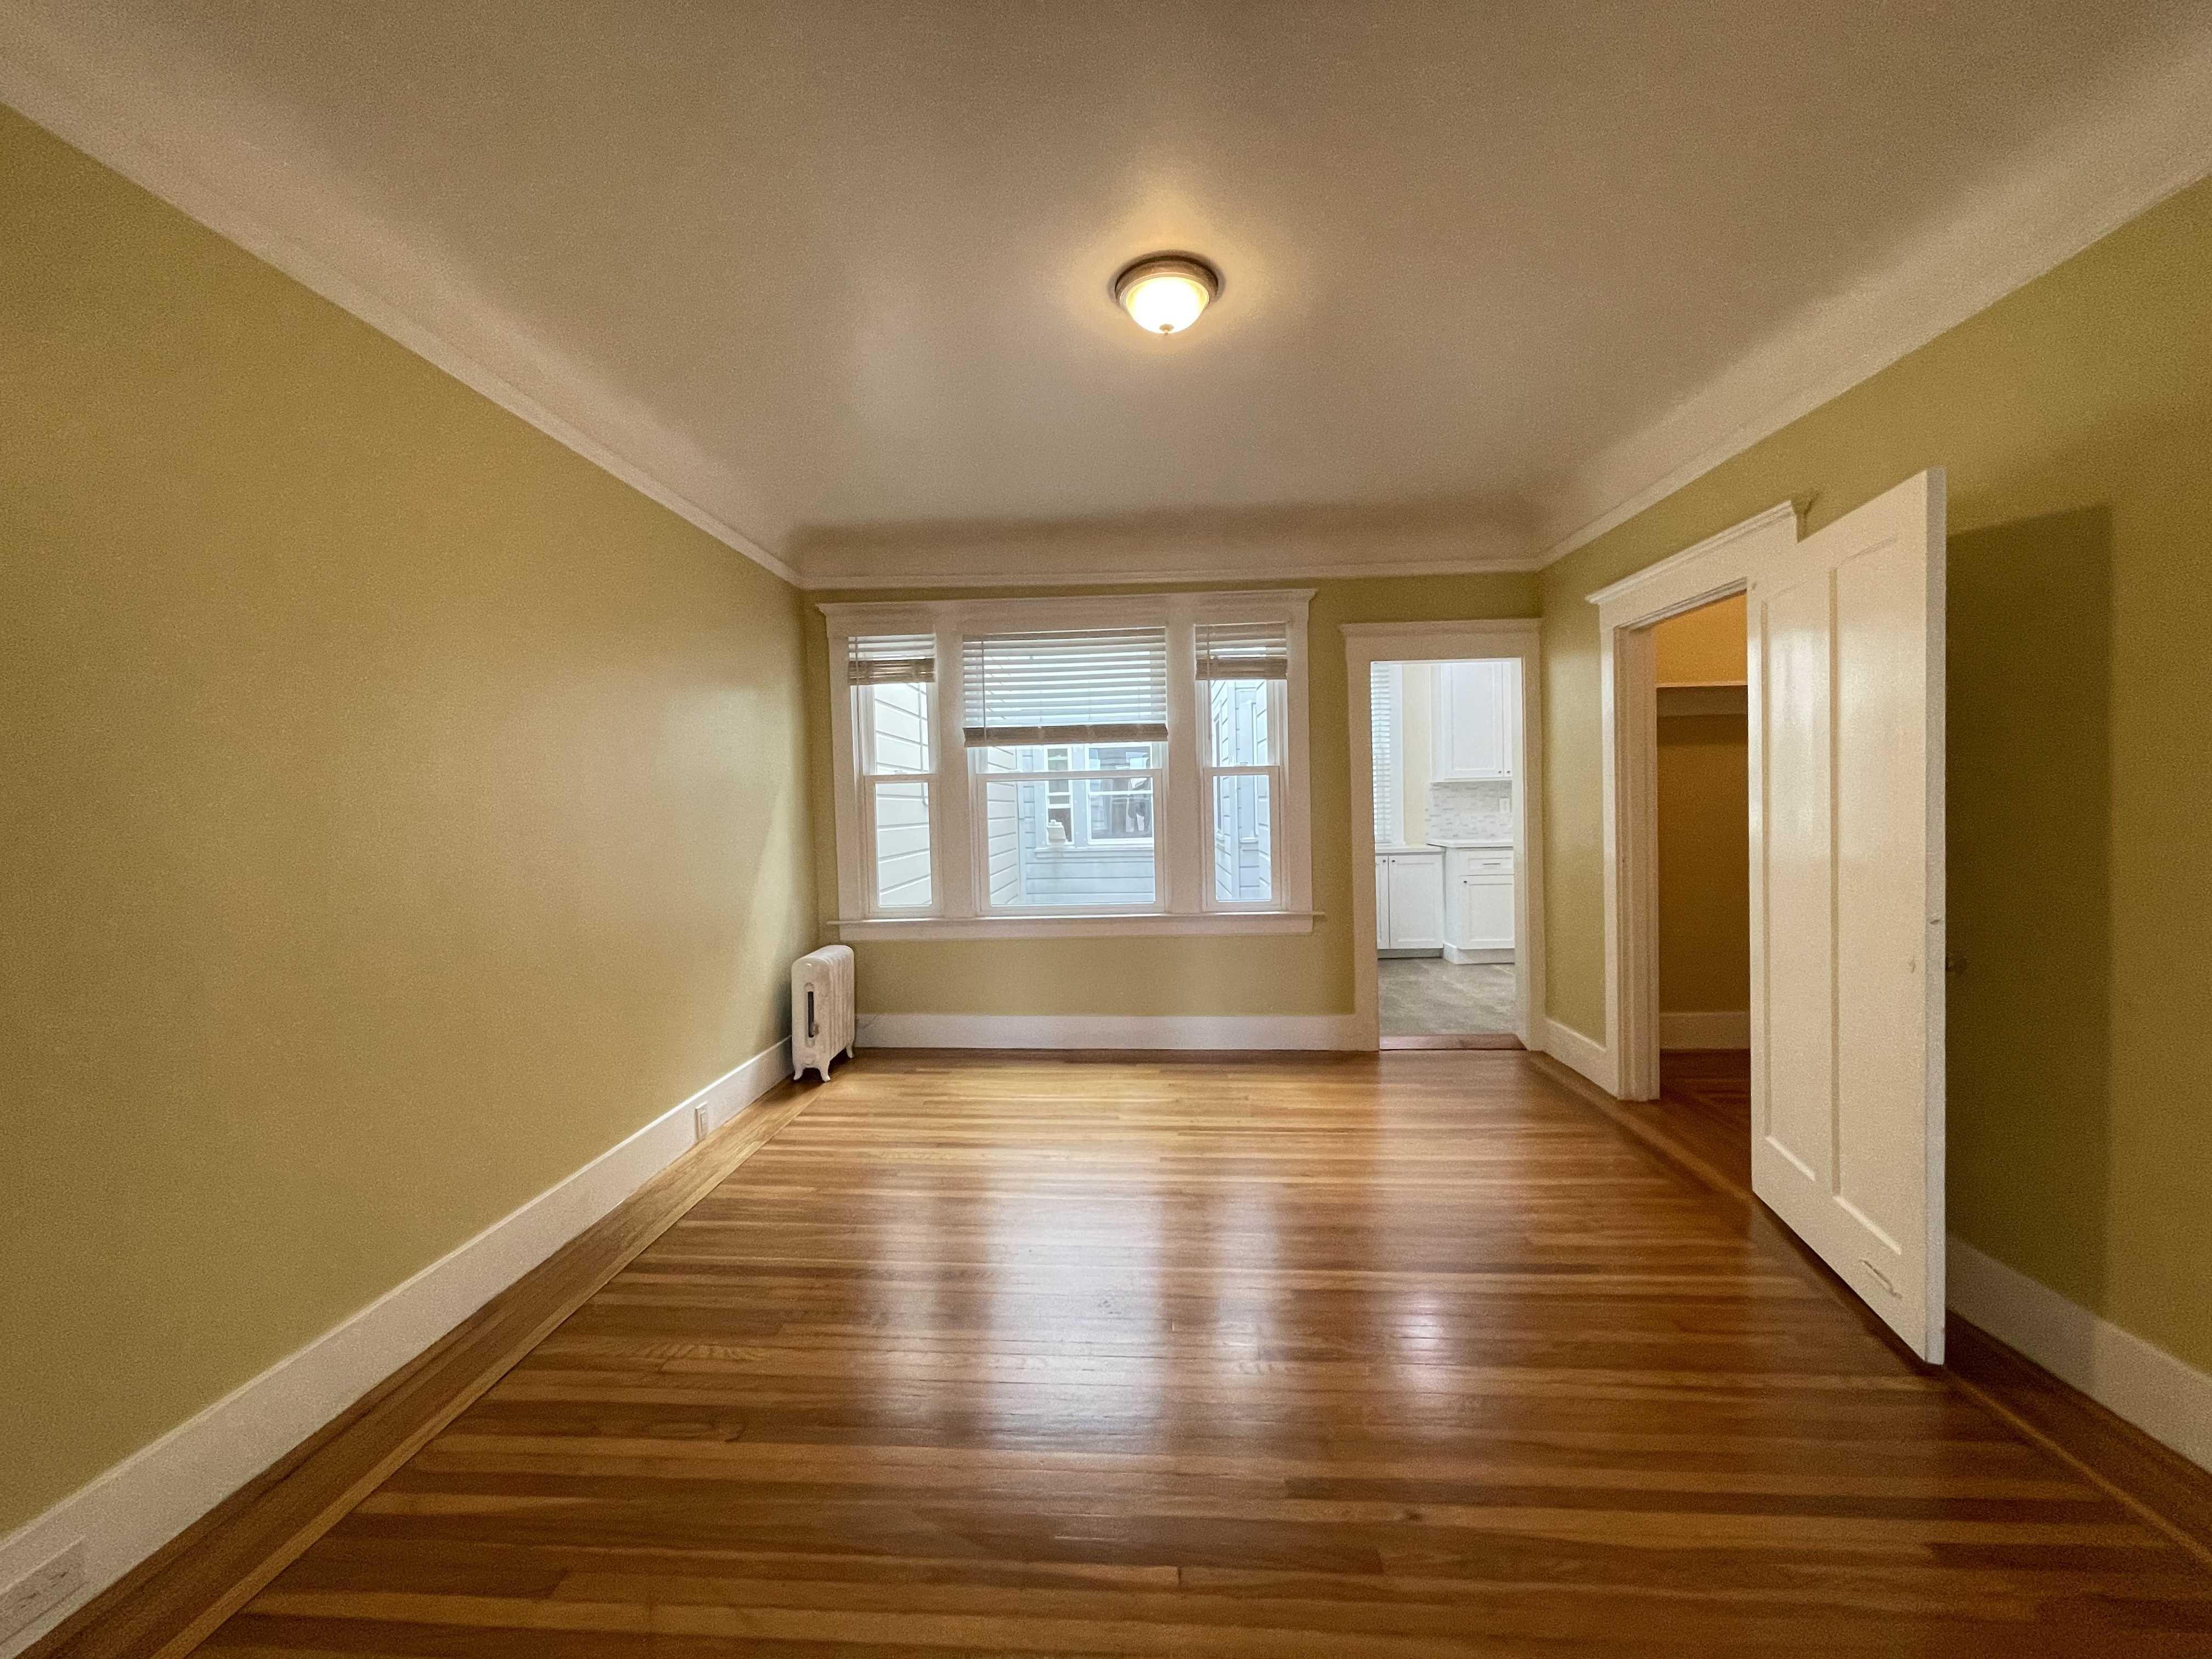 2340 Filbert Street  # 4, San Francisco, CA, 94123 - 5